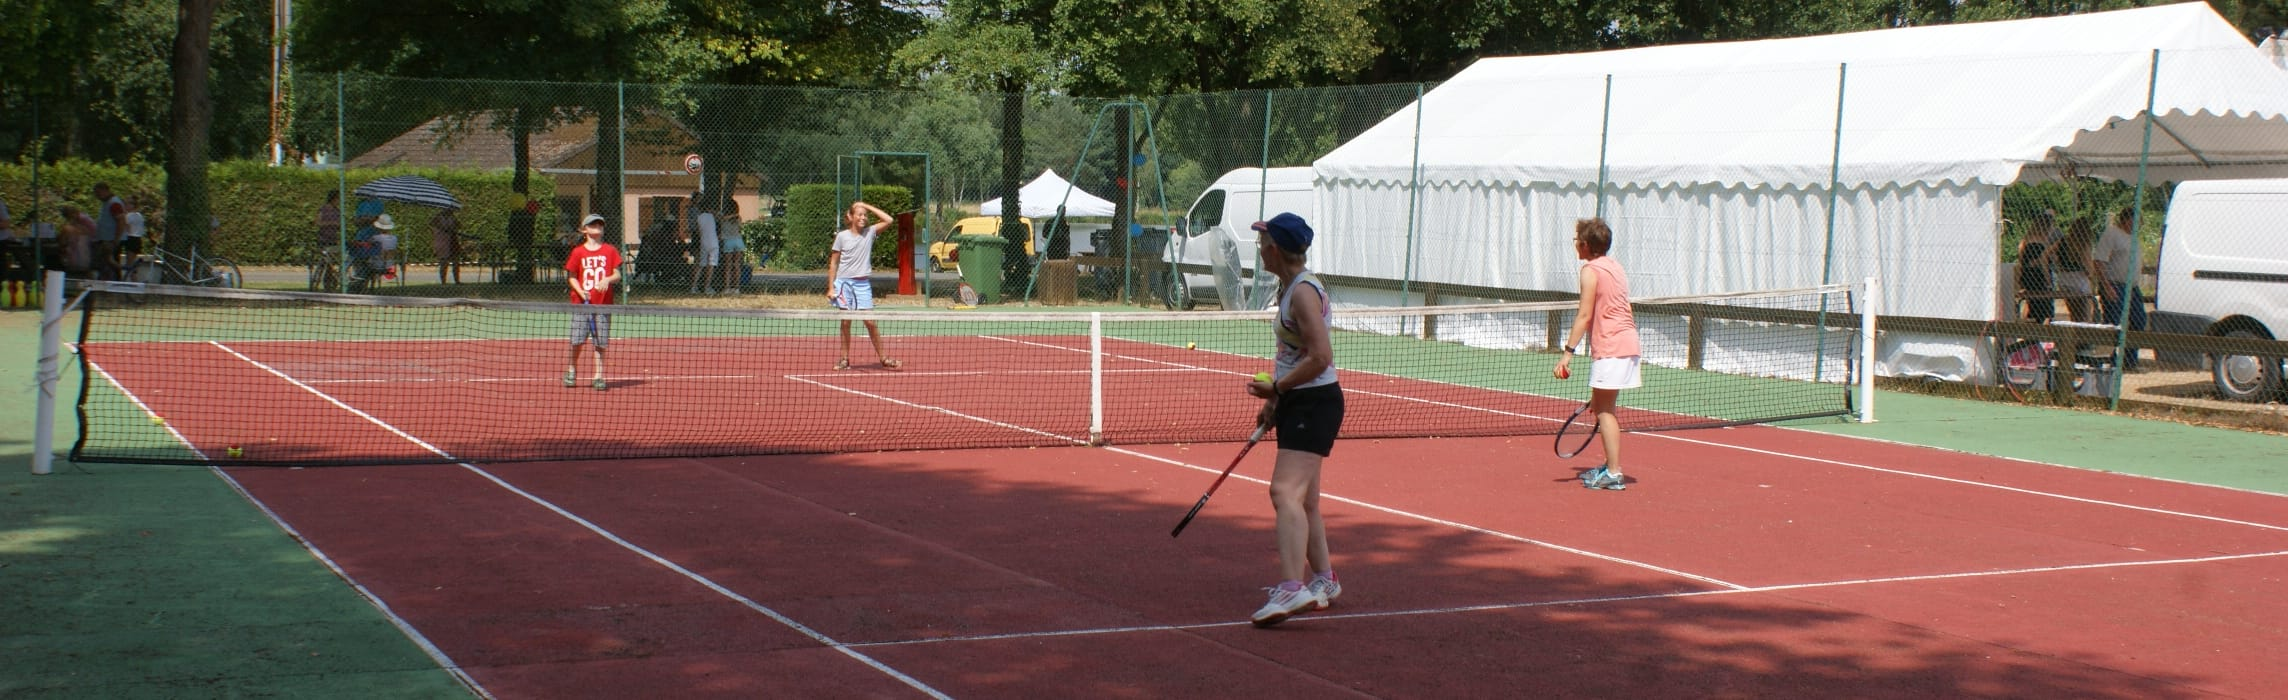 Mjc Tennis Bellegarde